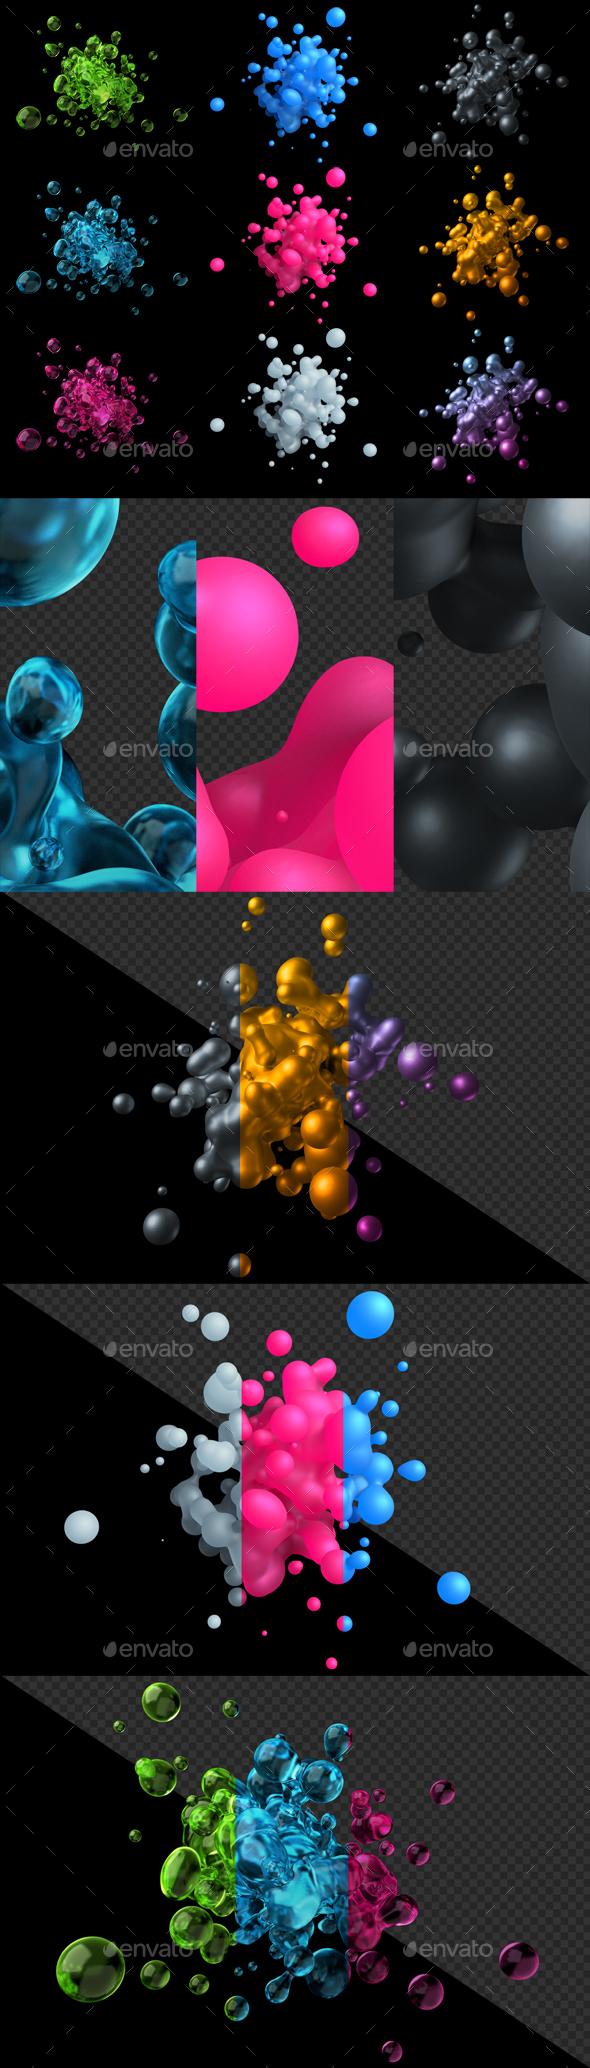 3D Renders of Liquid Splashes - Abstract 3D Renders